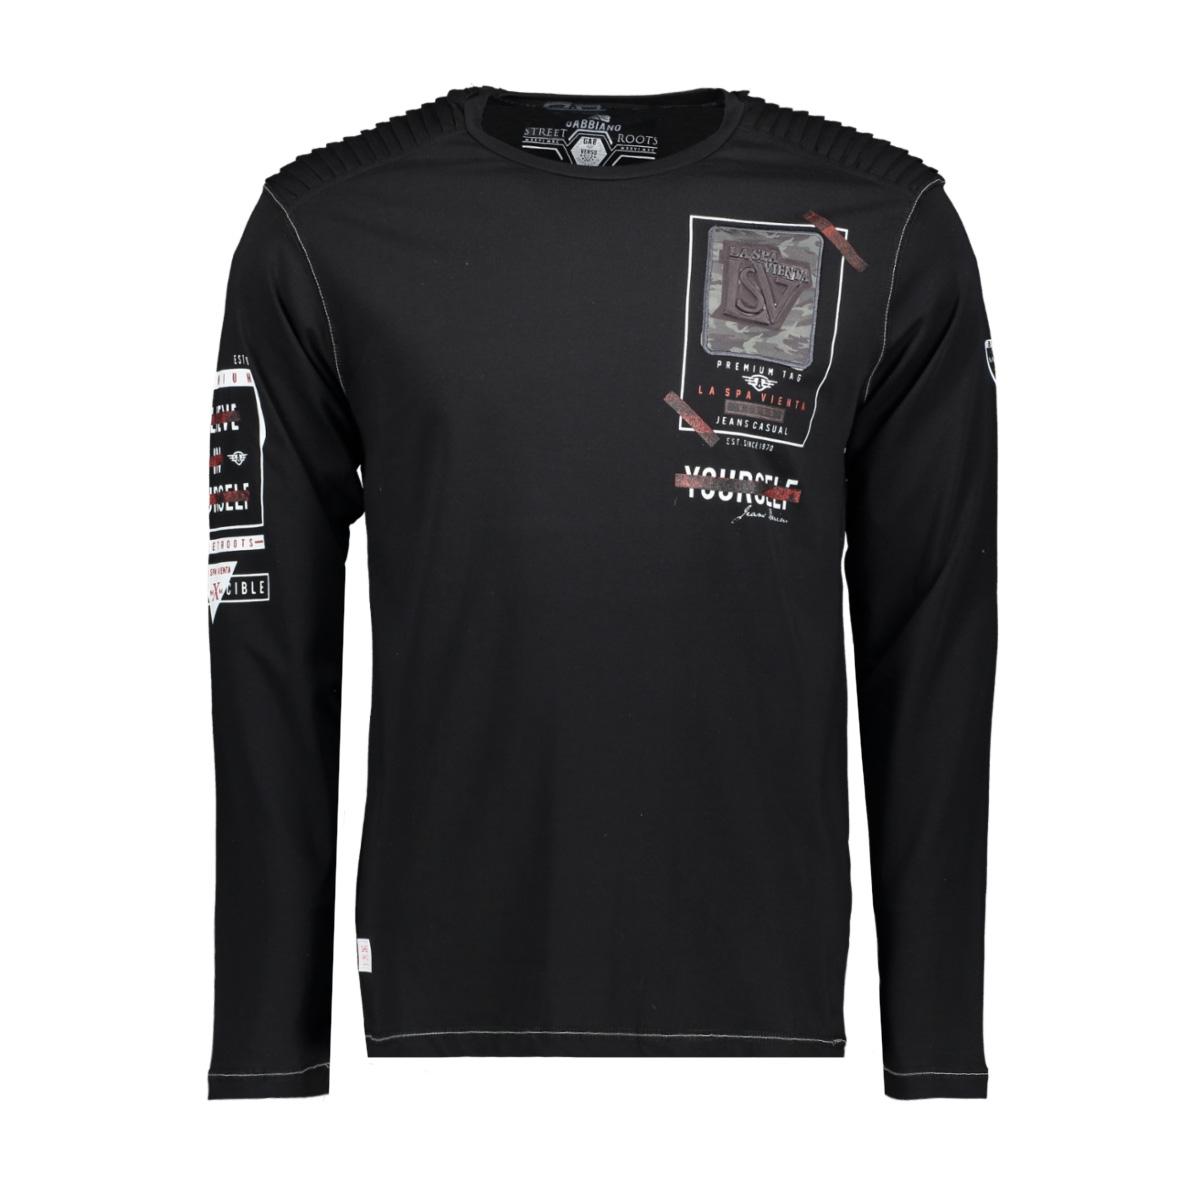 gabbiano t shirt 13857 gabbiano t-shirt black